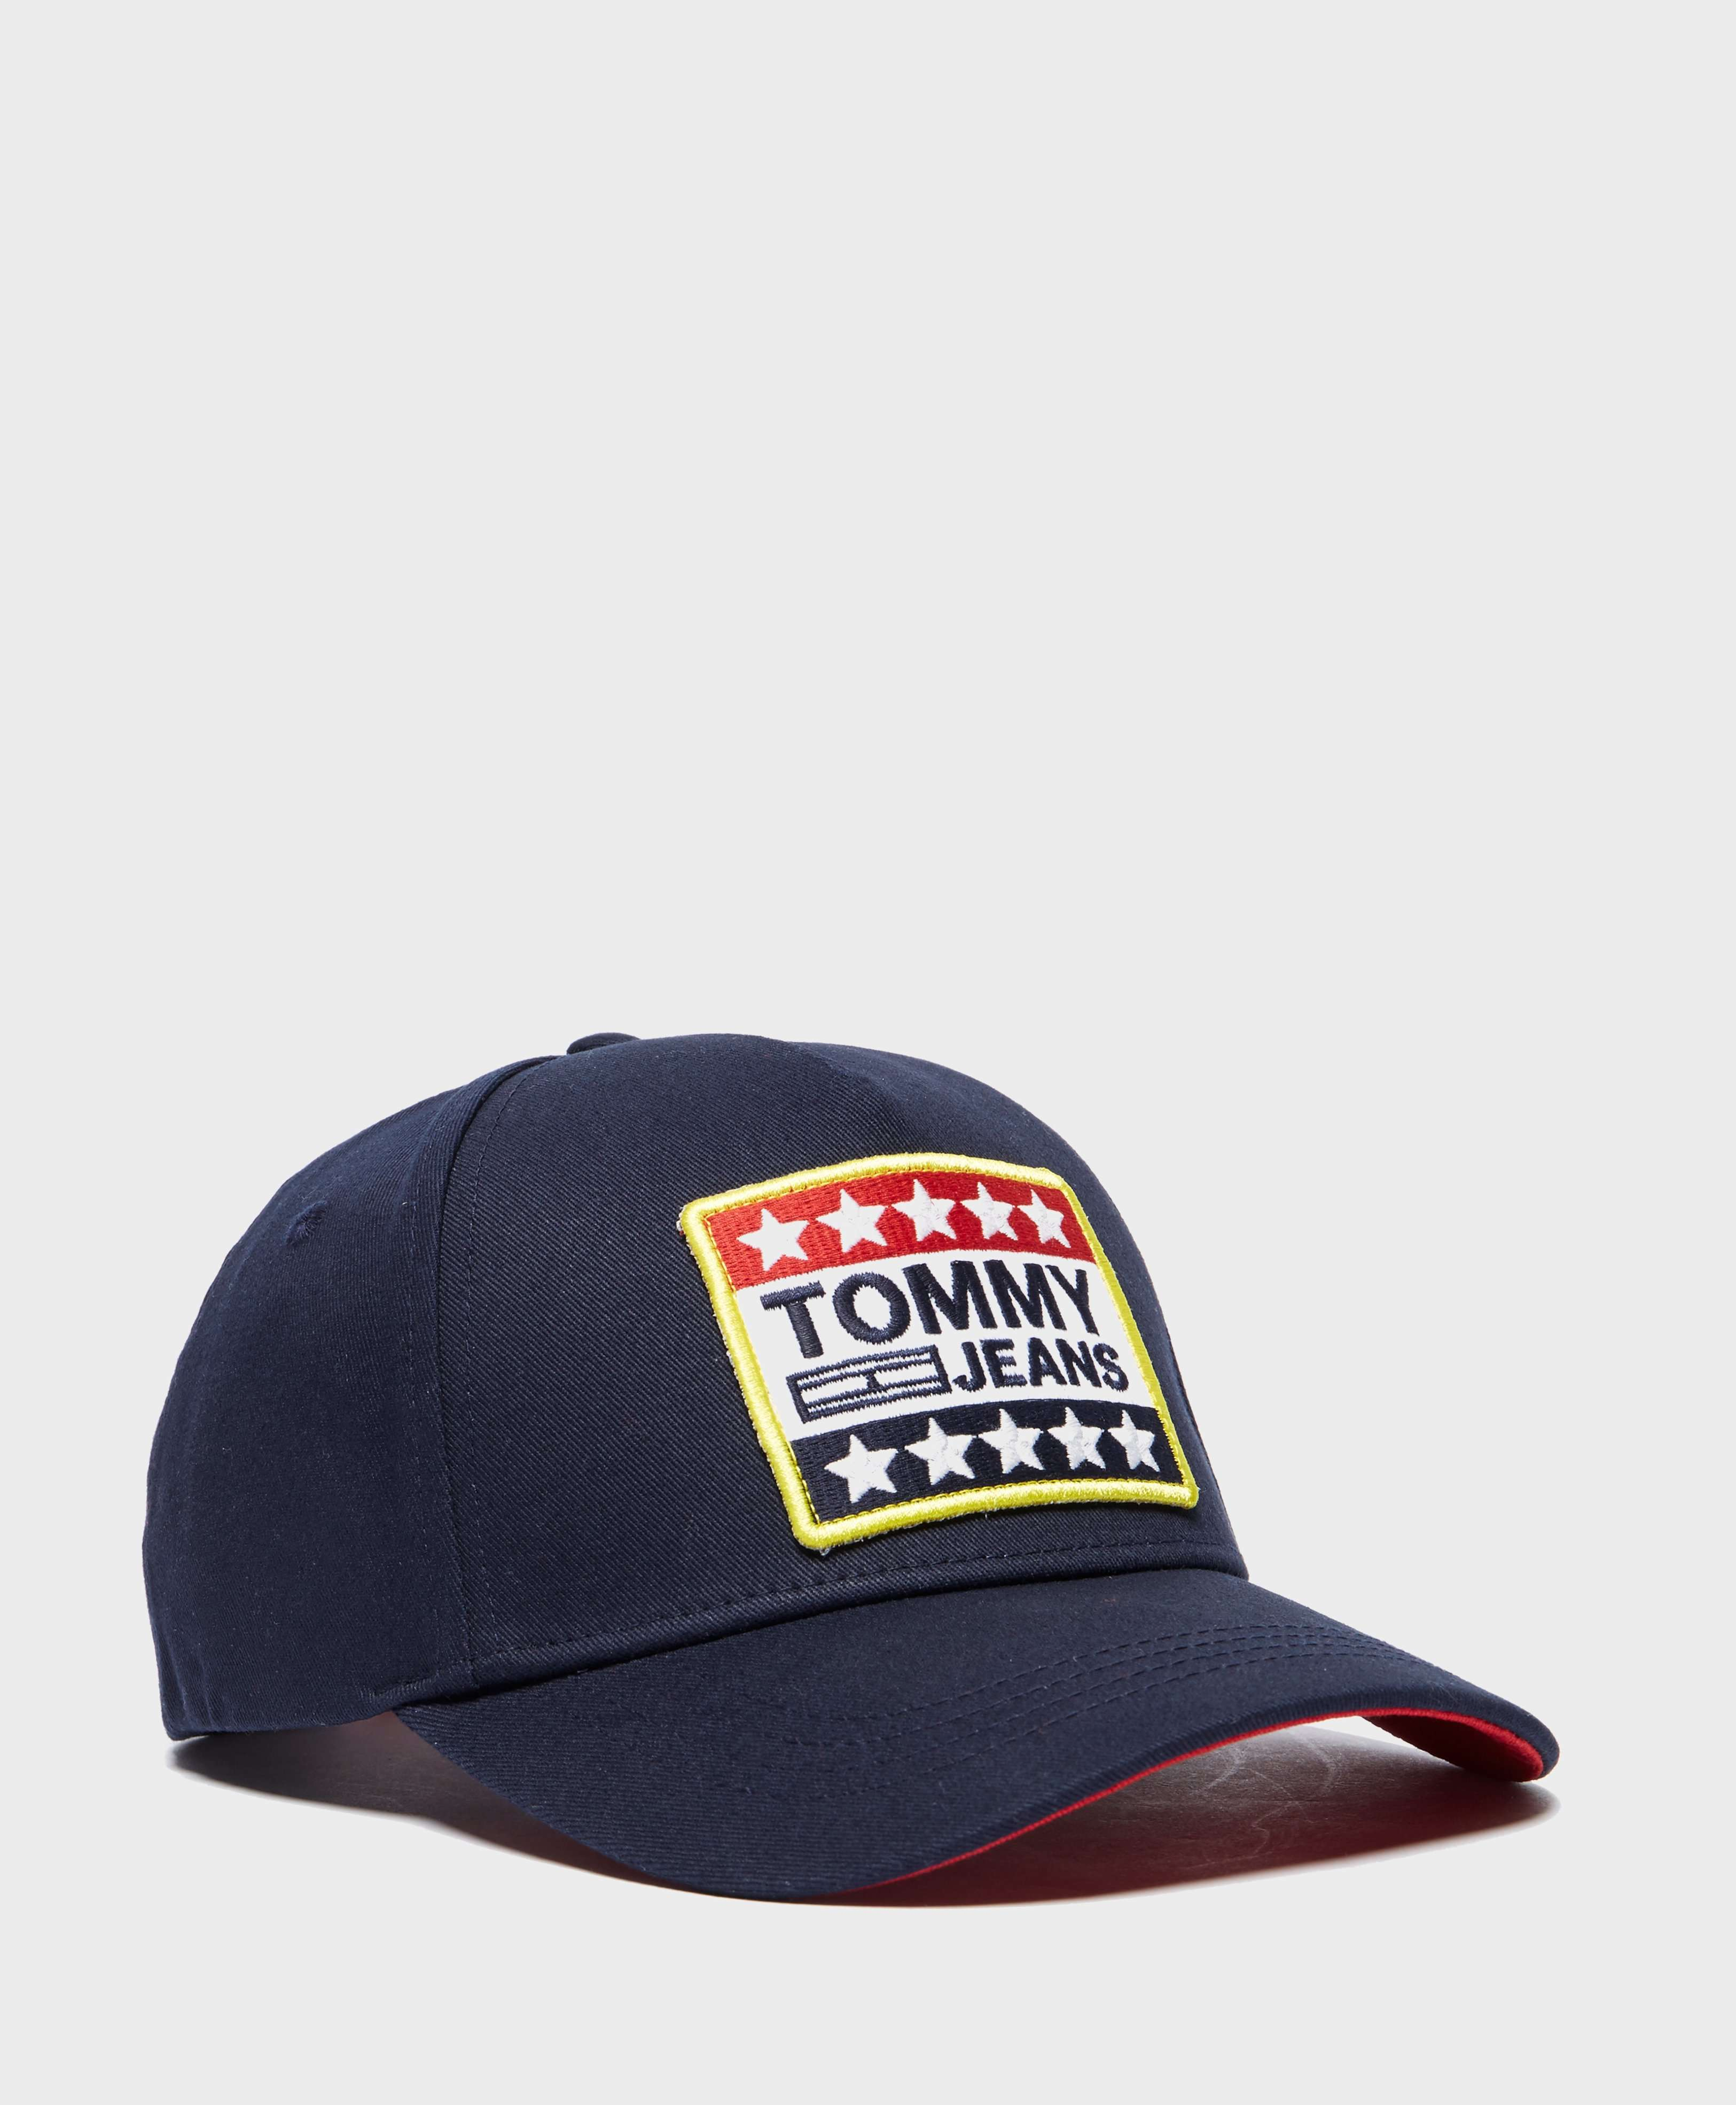 Tommy Jeans Patch Logo Cap - Online Exclusive